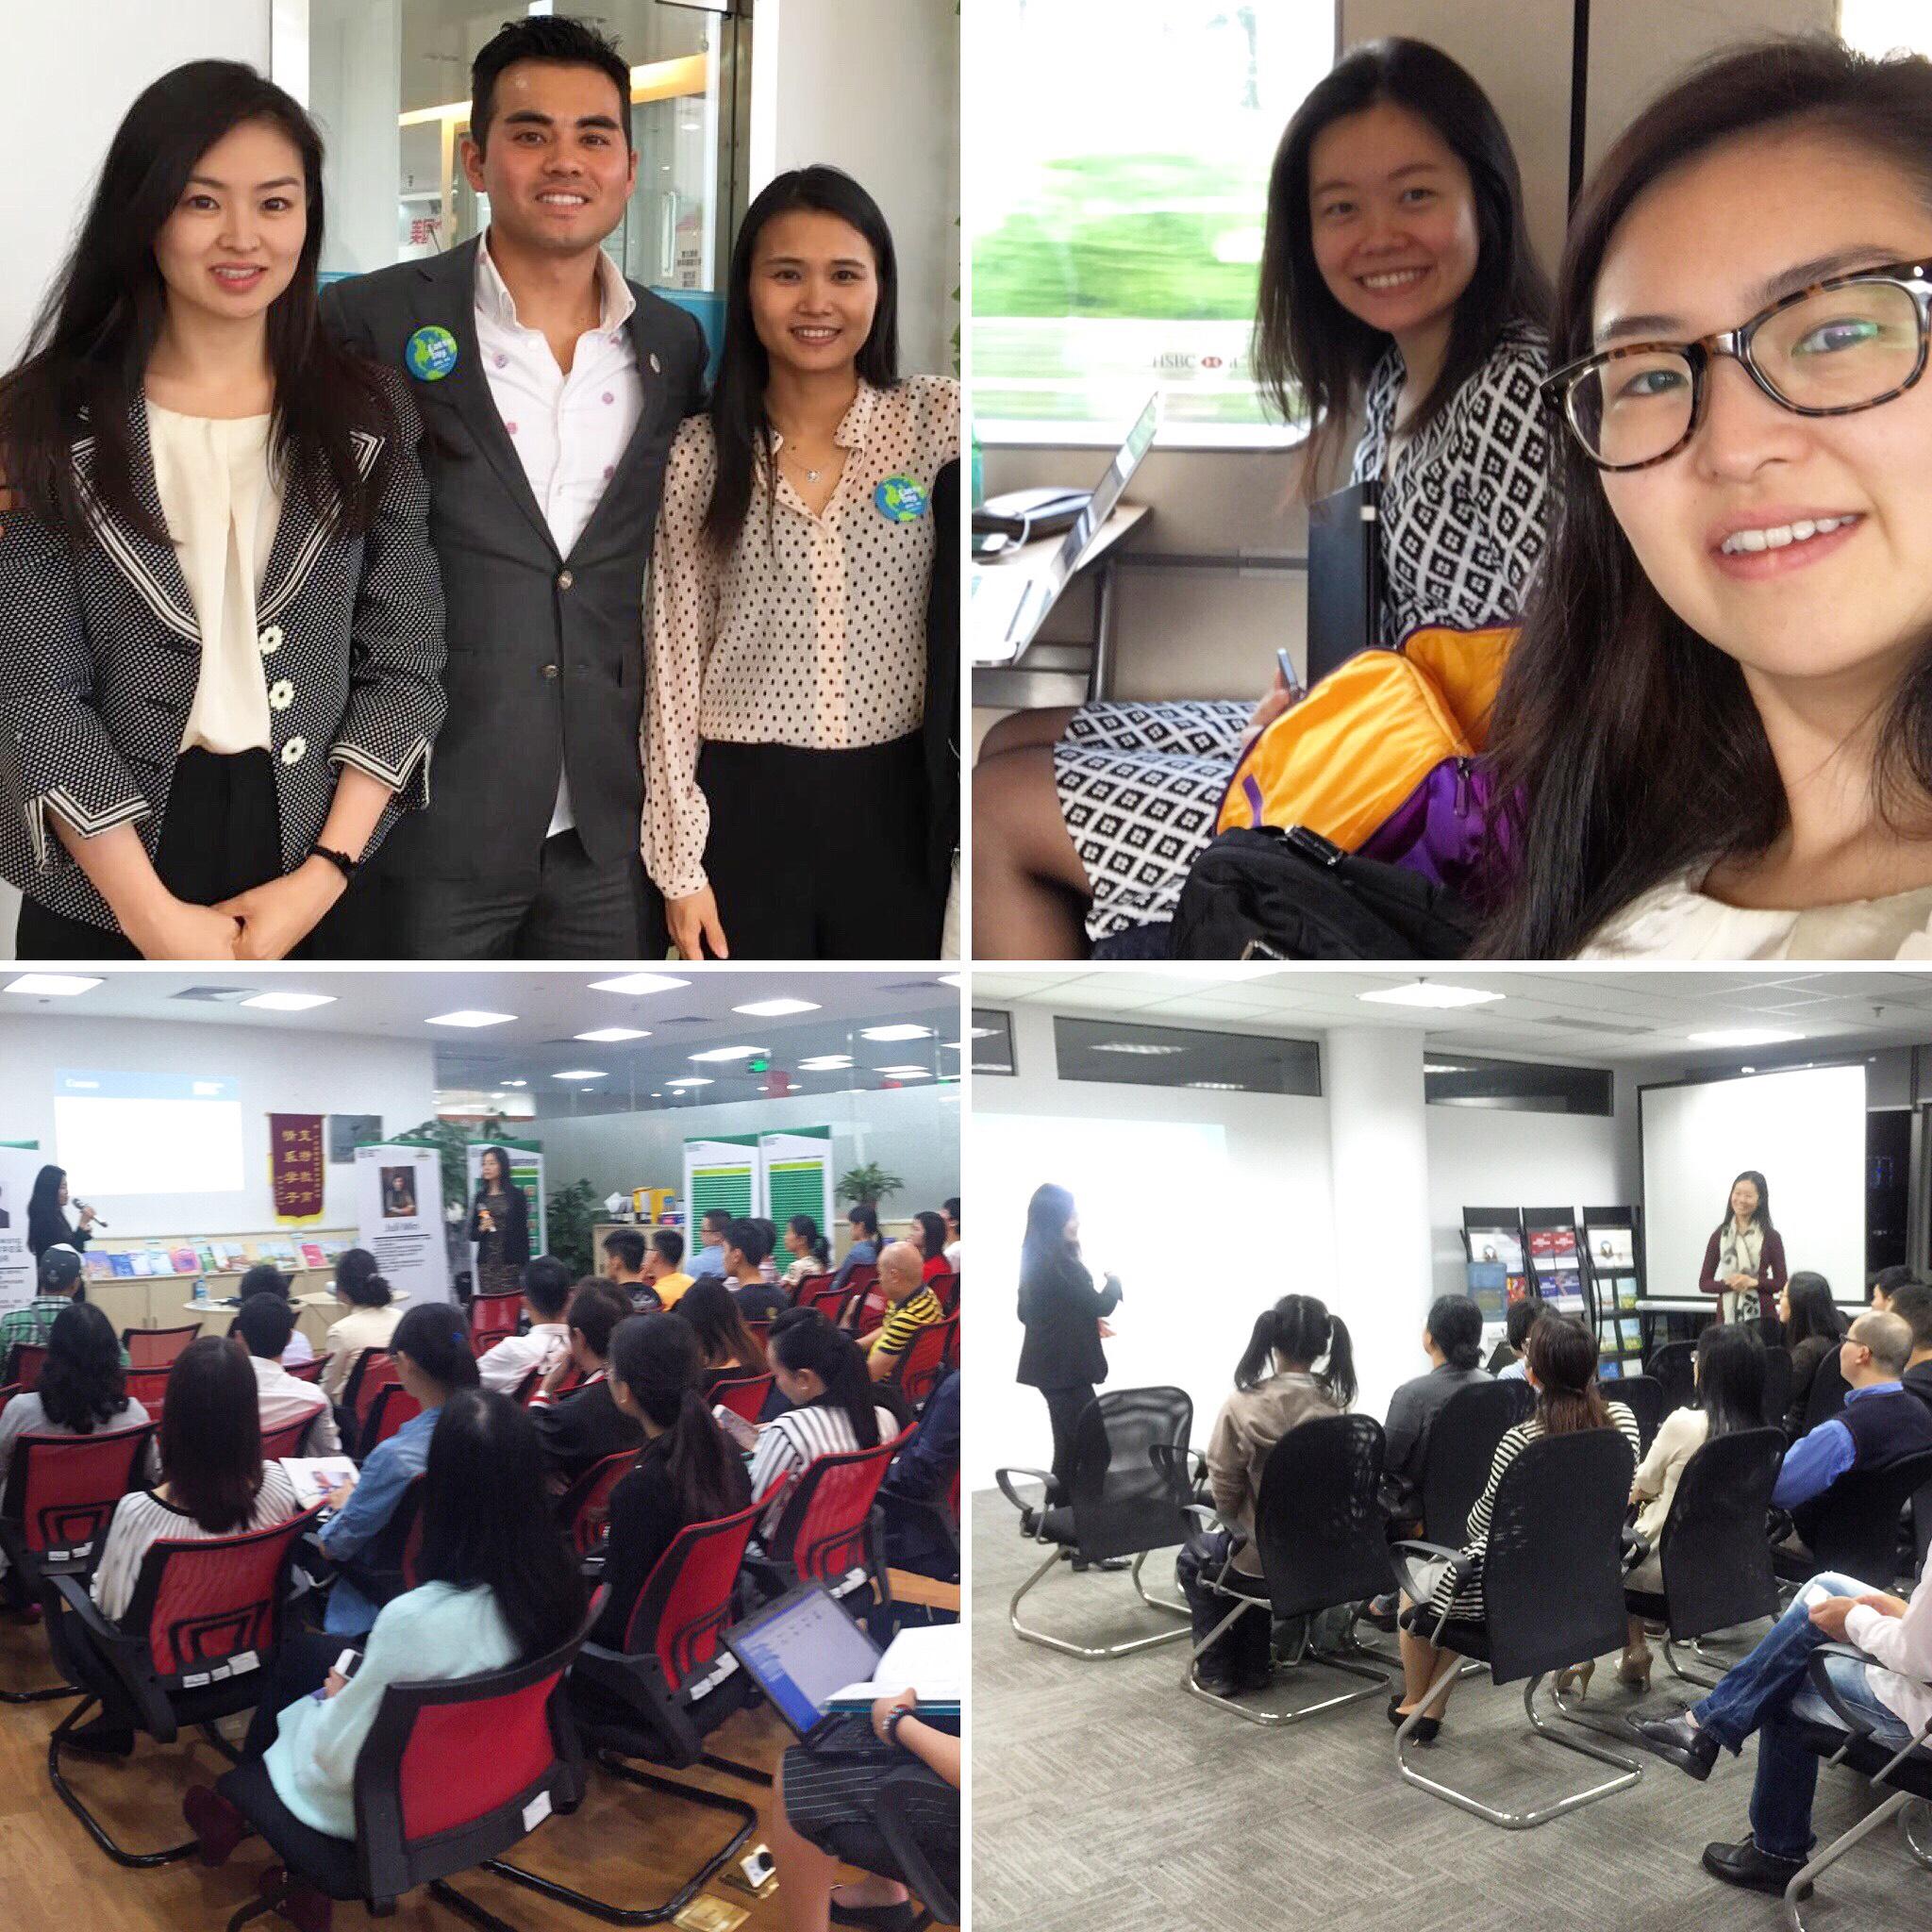 From top left, clockwise: Shenzhen team, train ride, Guangzhou lecture, Hangzhou lecture